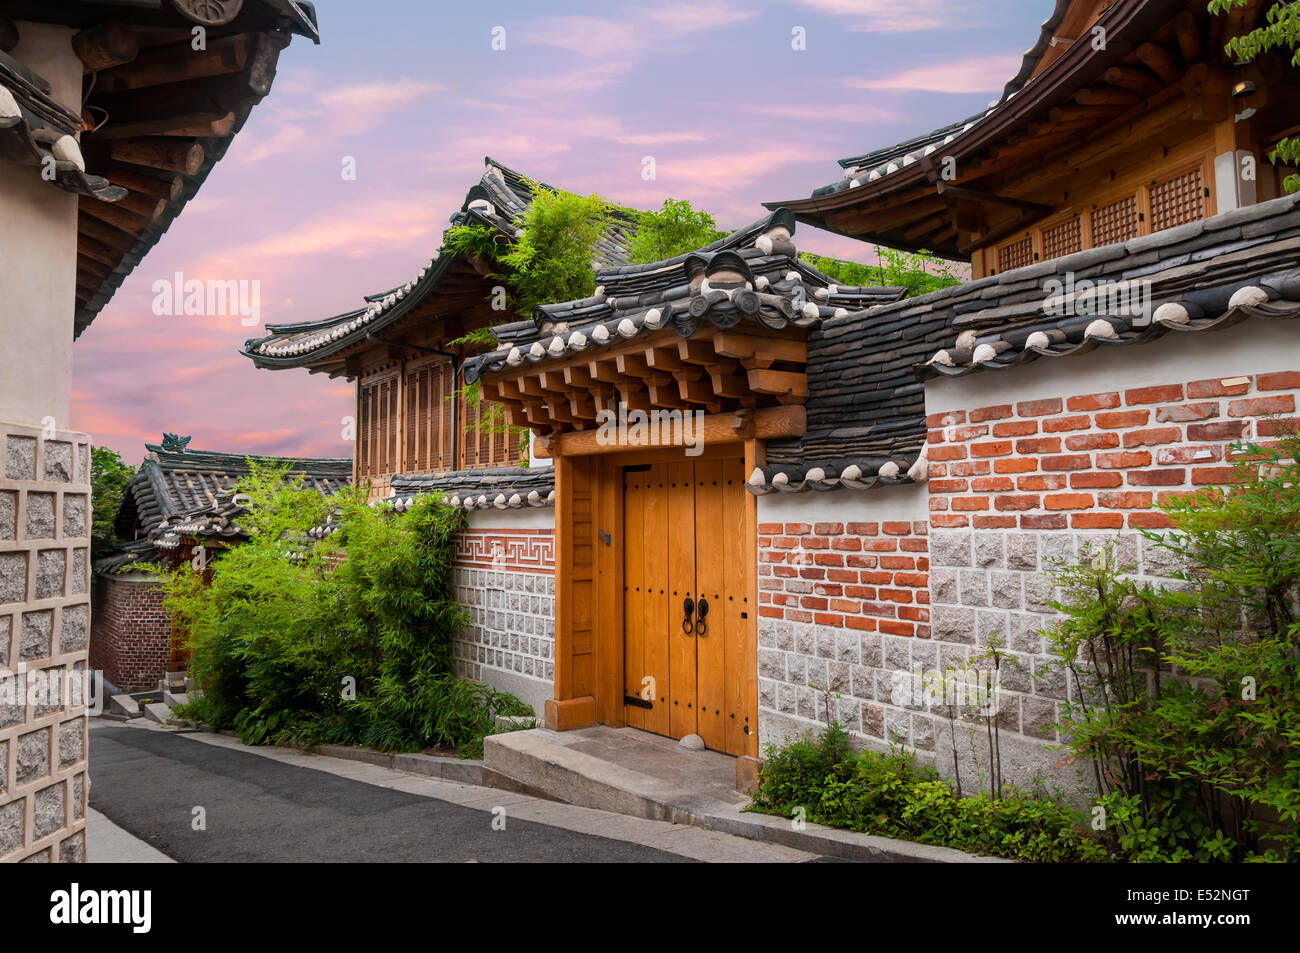 Traditional Korean Architecture In Bukchon Hanok Village Seoul South Korea